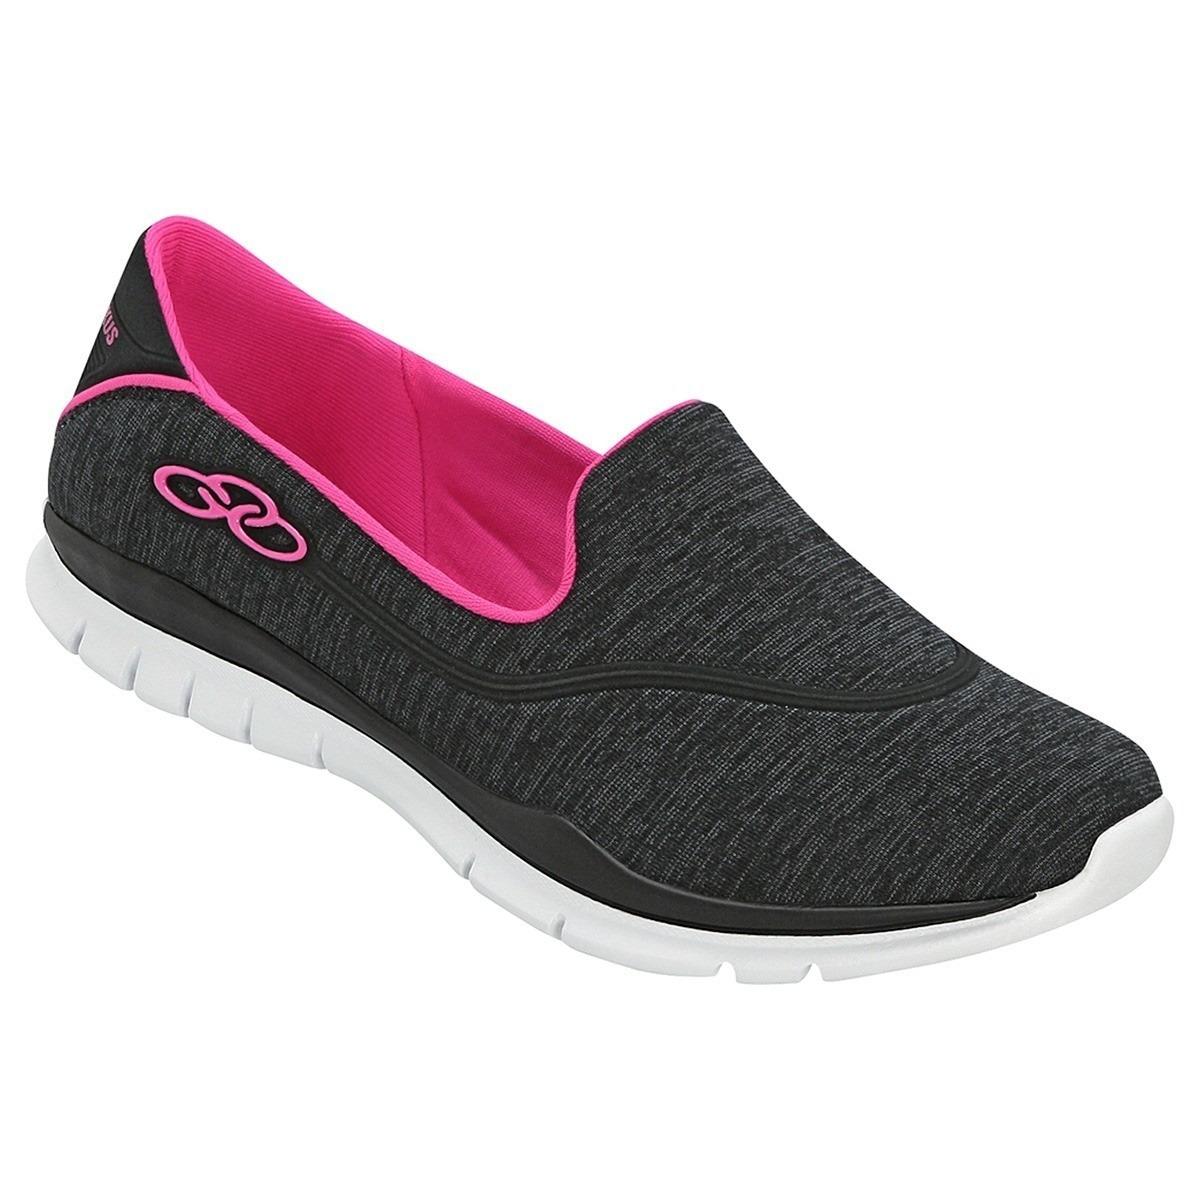 d94ad2560e sapatilha tenis feminina olympikus angel feetpad original. Carregando zoom.